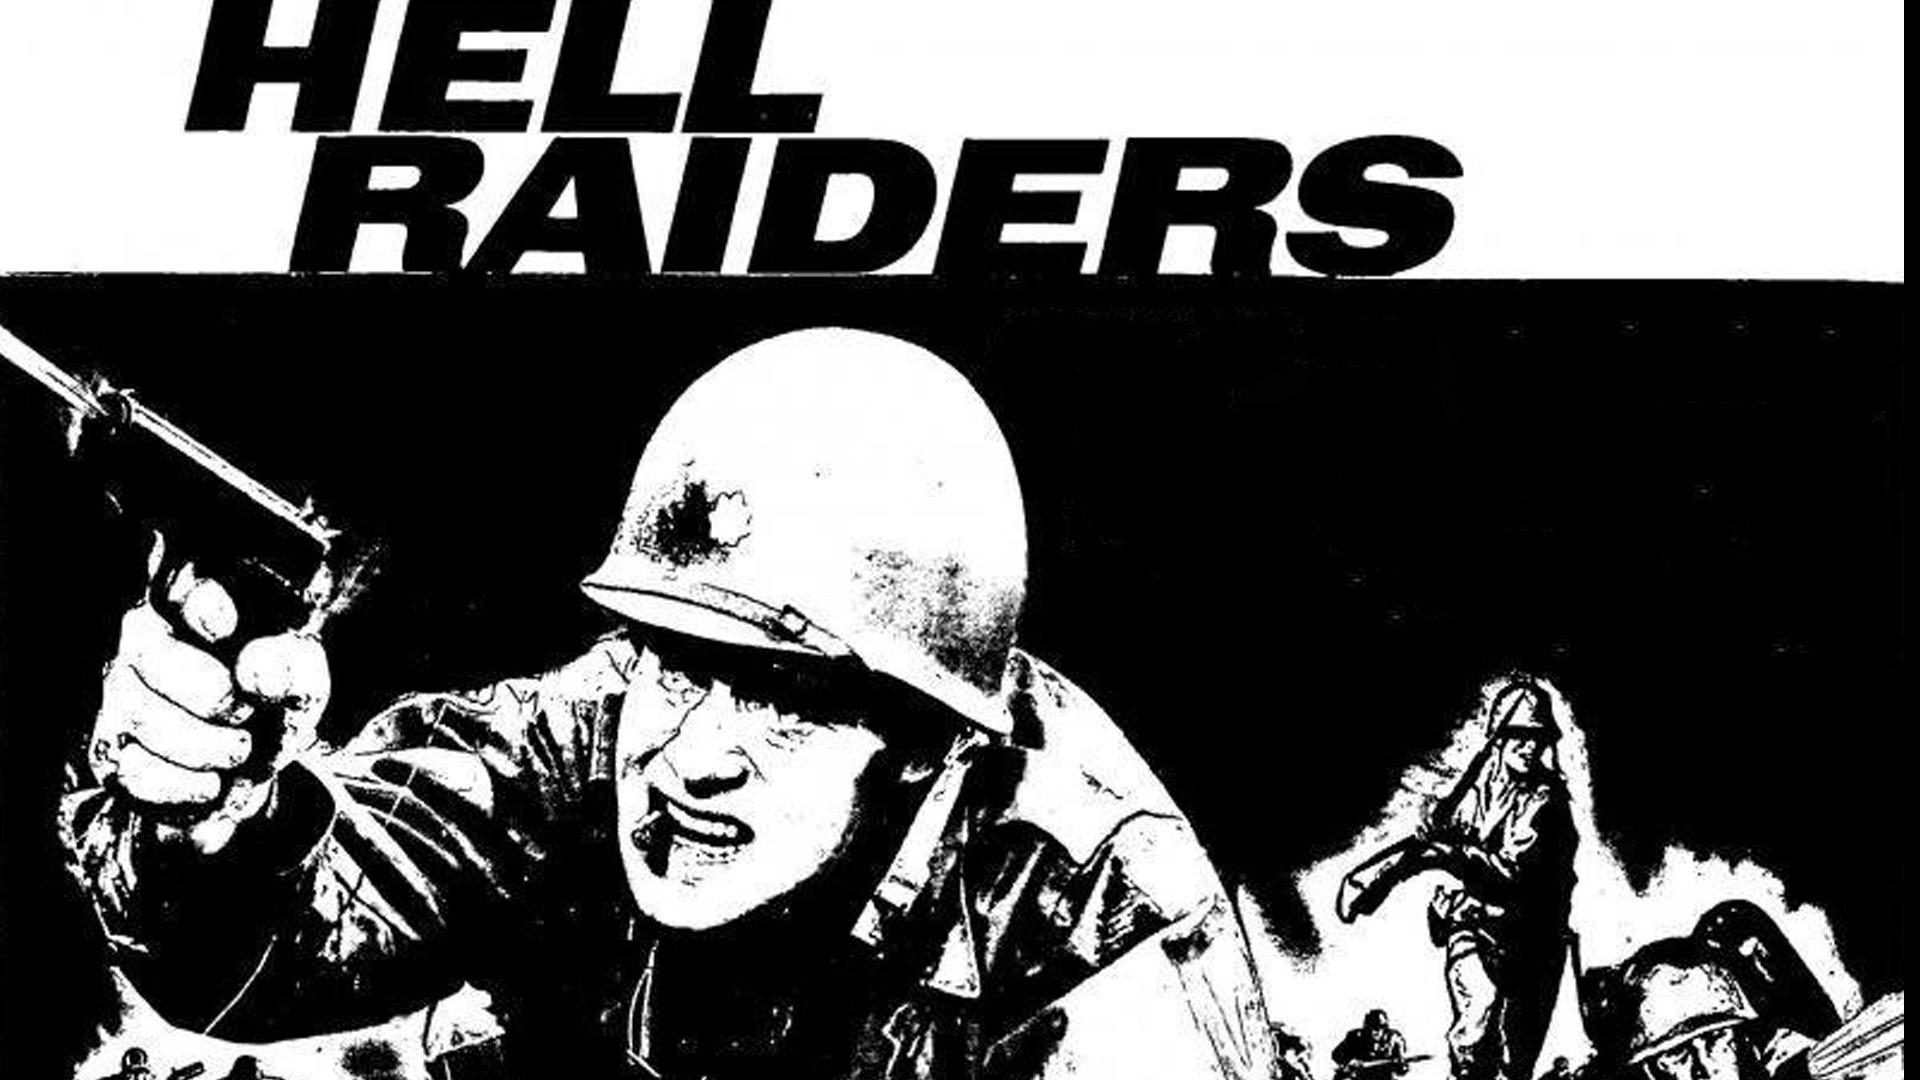 Hell Raiders